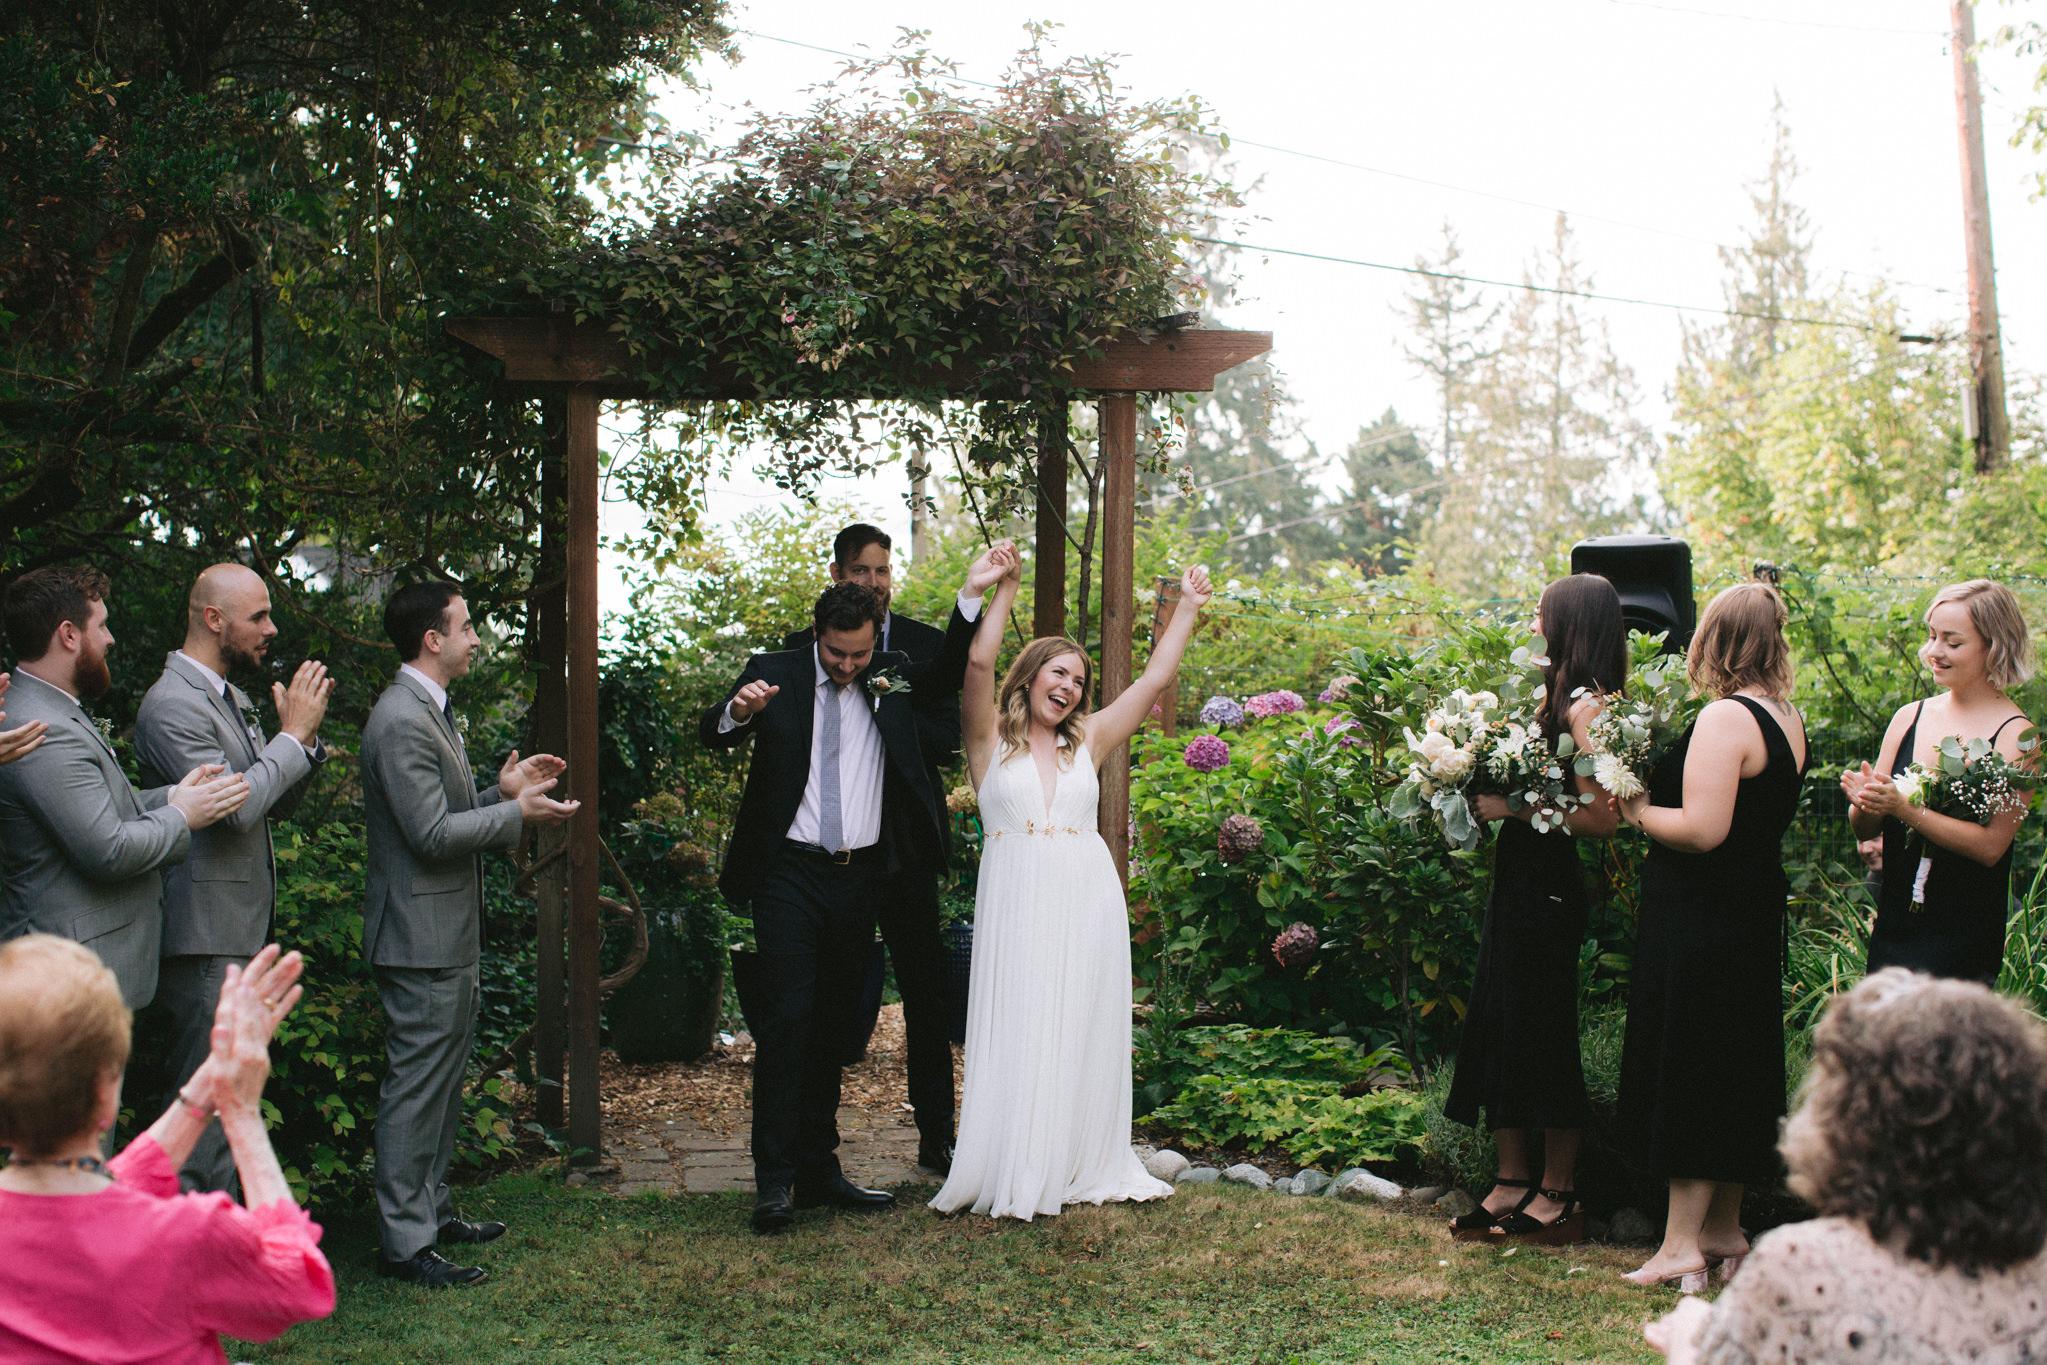 Backyard-Bainbridge-Island-Wedding-Alycia-Lovell-Photography-117.JPG